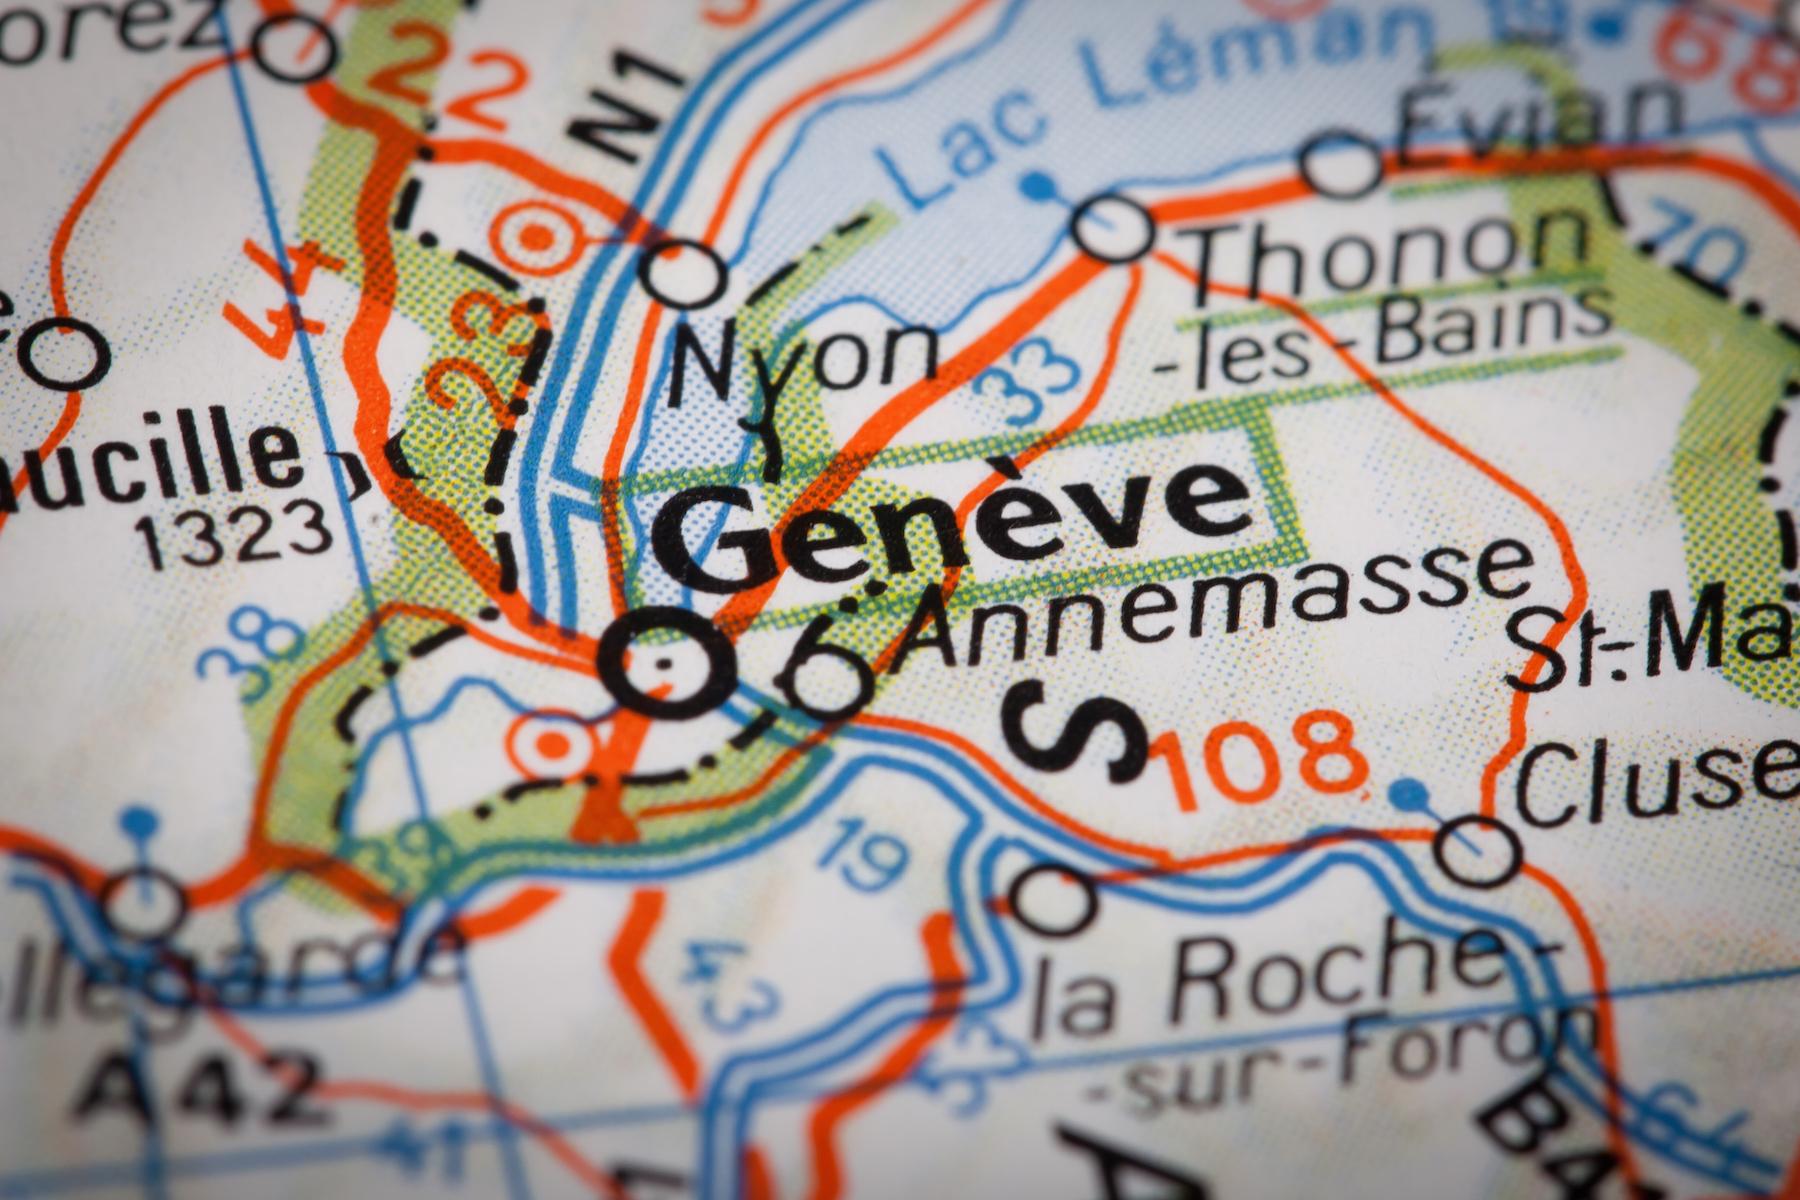 Geneve-